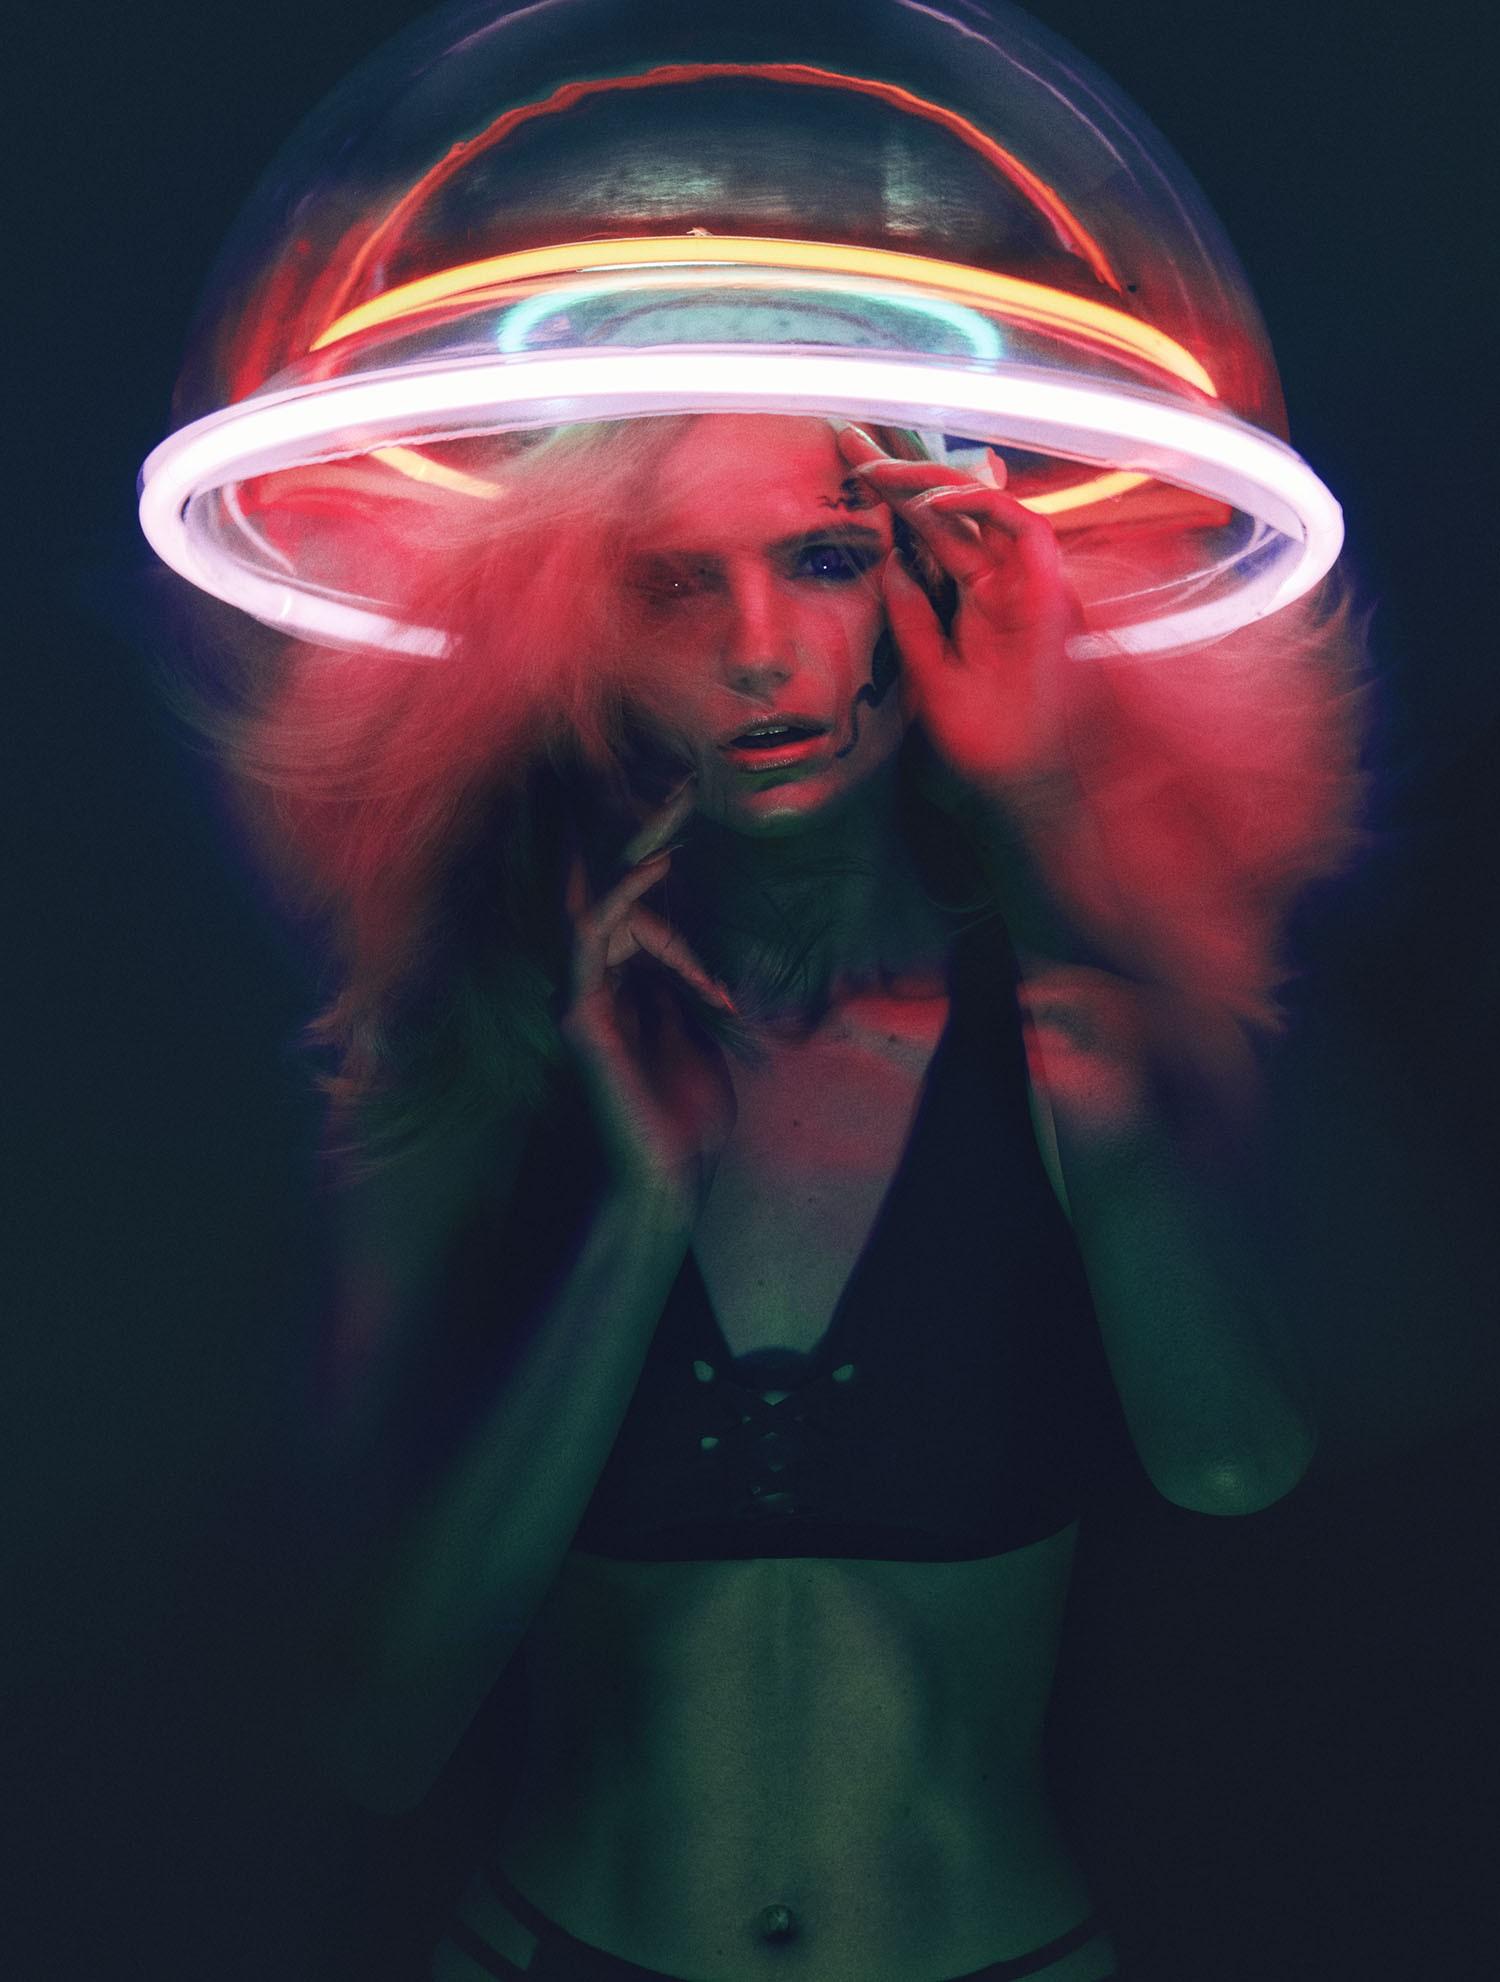 Neon headpiece in Vogue Brazil.